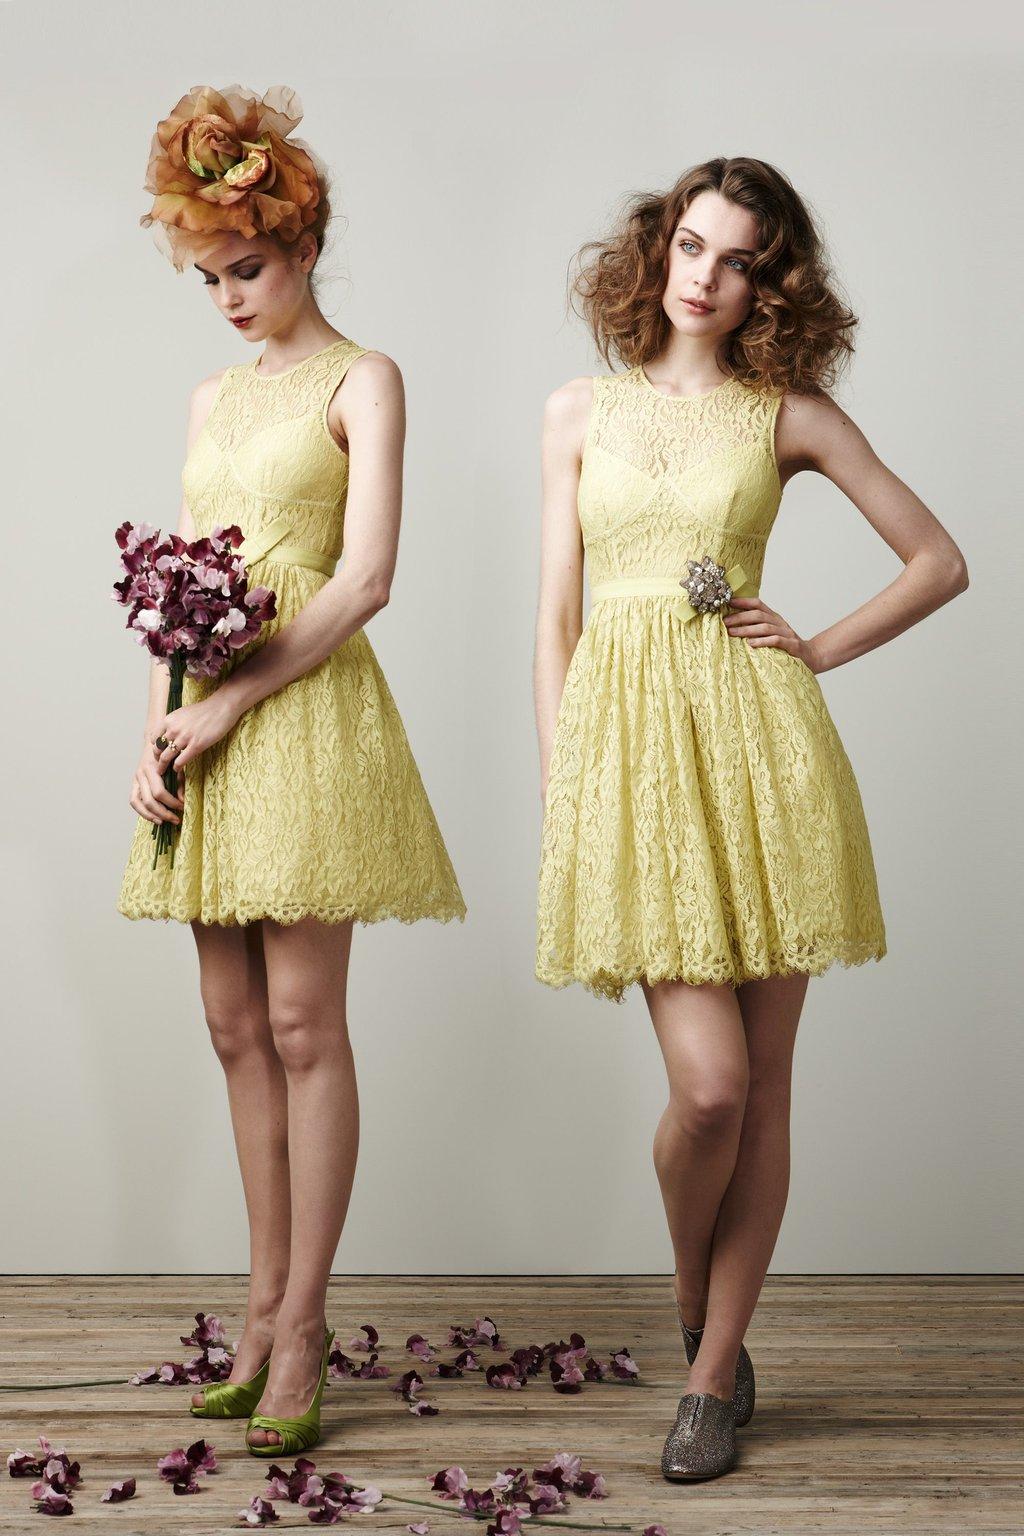 Memorable Wedding Pretty Pastels - Trendy Colors